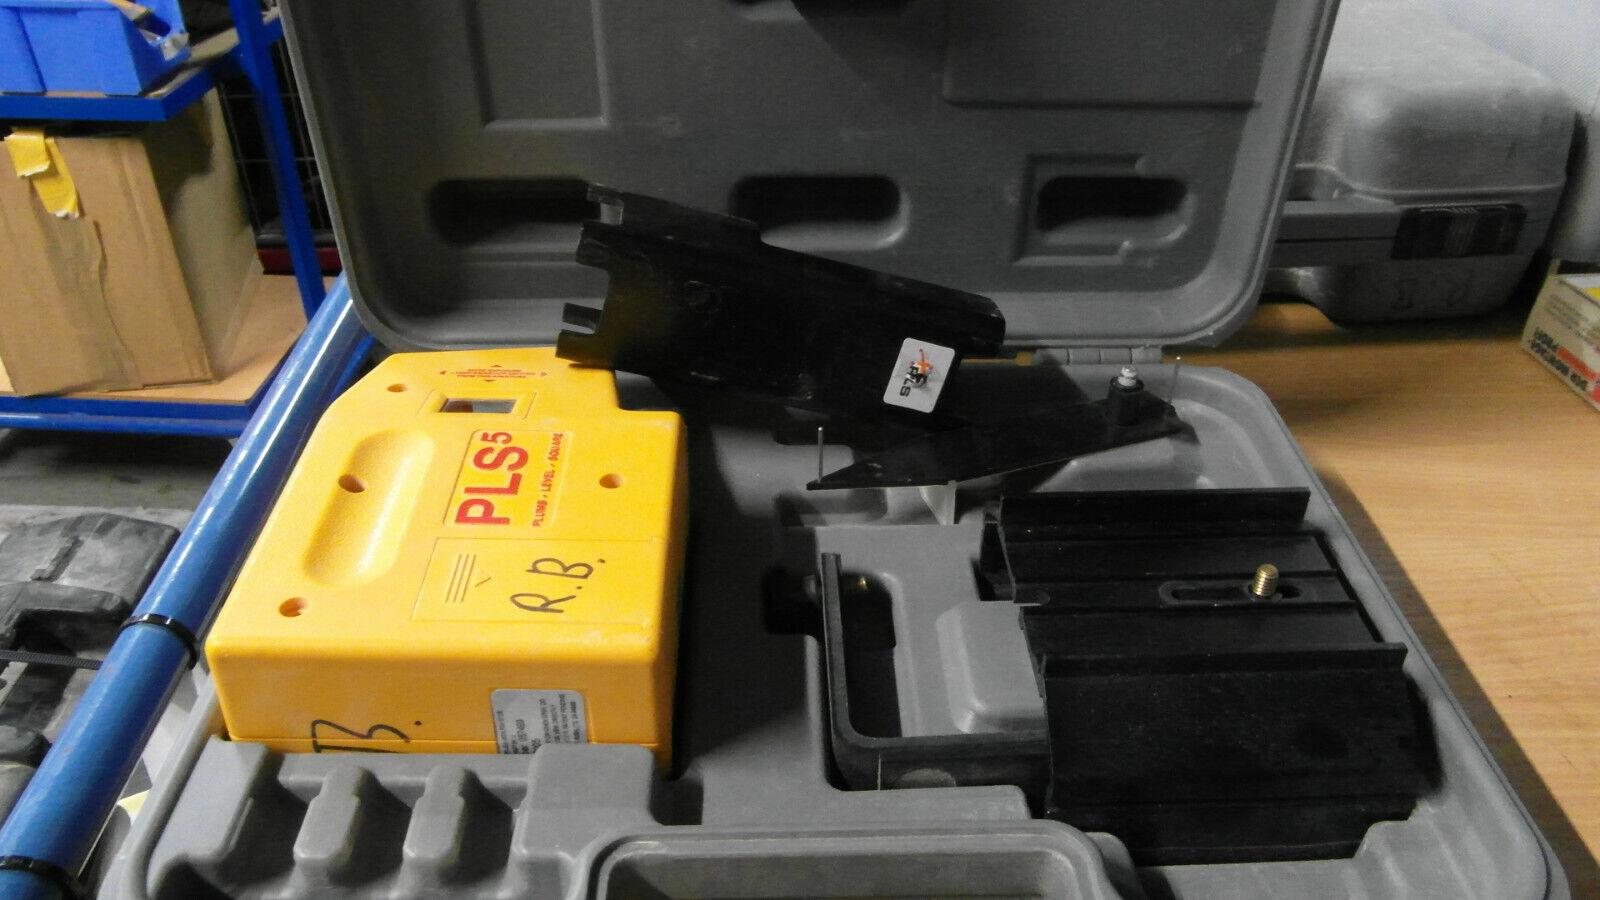 PLS 5 Laser Punkt Laser pacific Laser systems  Gerät im Koffer rechnung